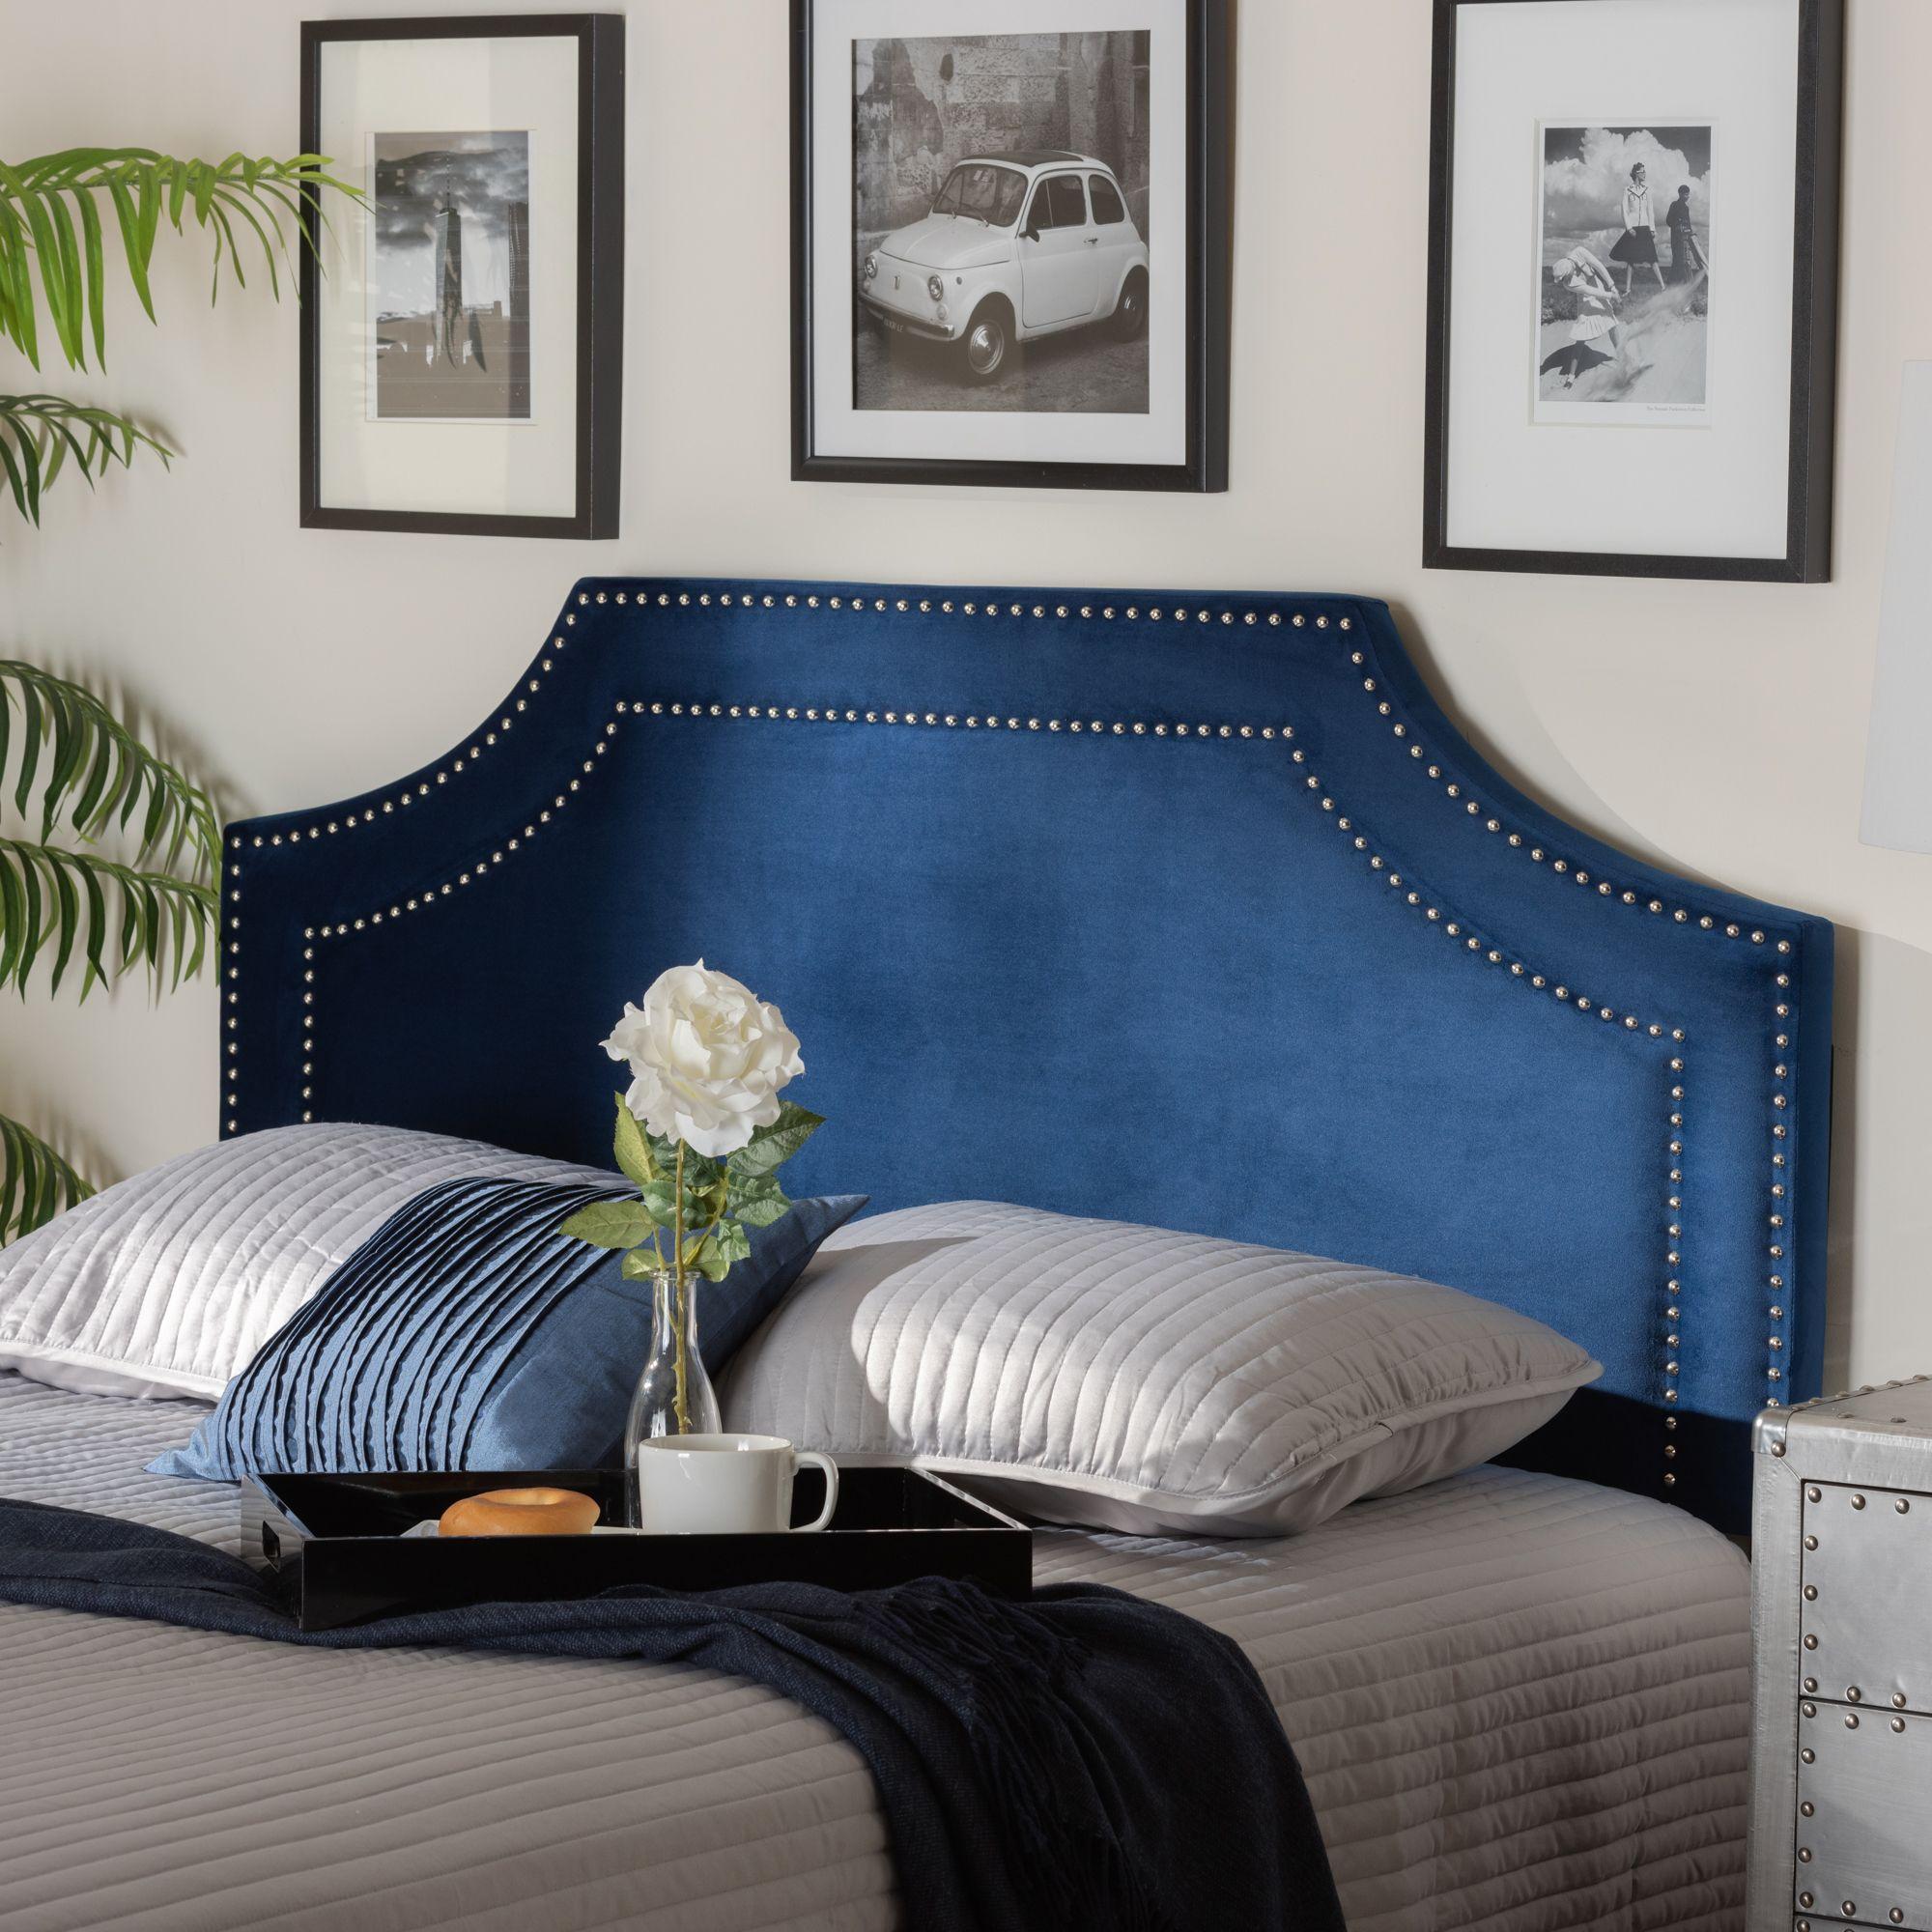 Baxton Studio Avignon Modern and Contemporary Navy Blue